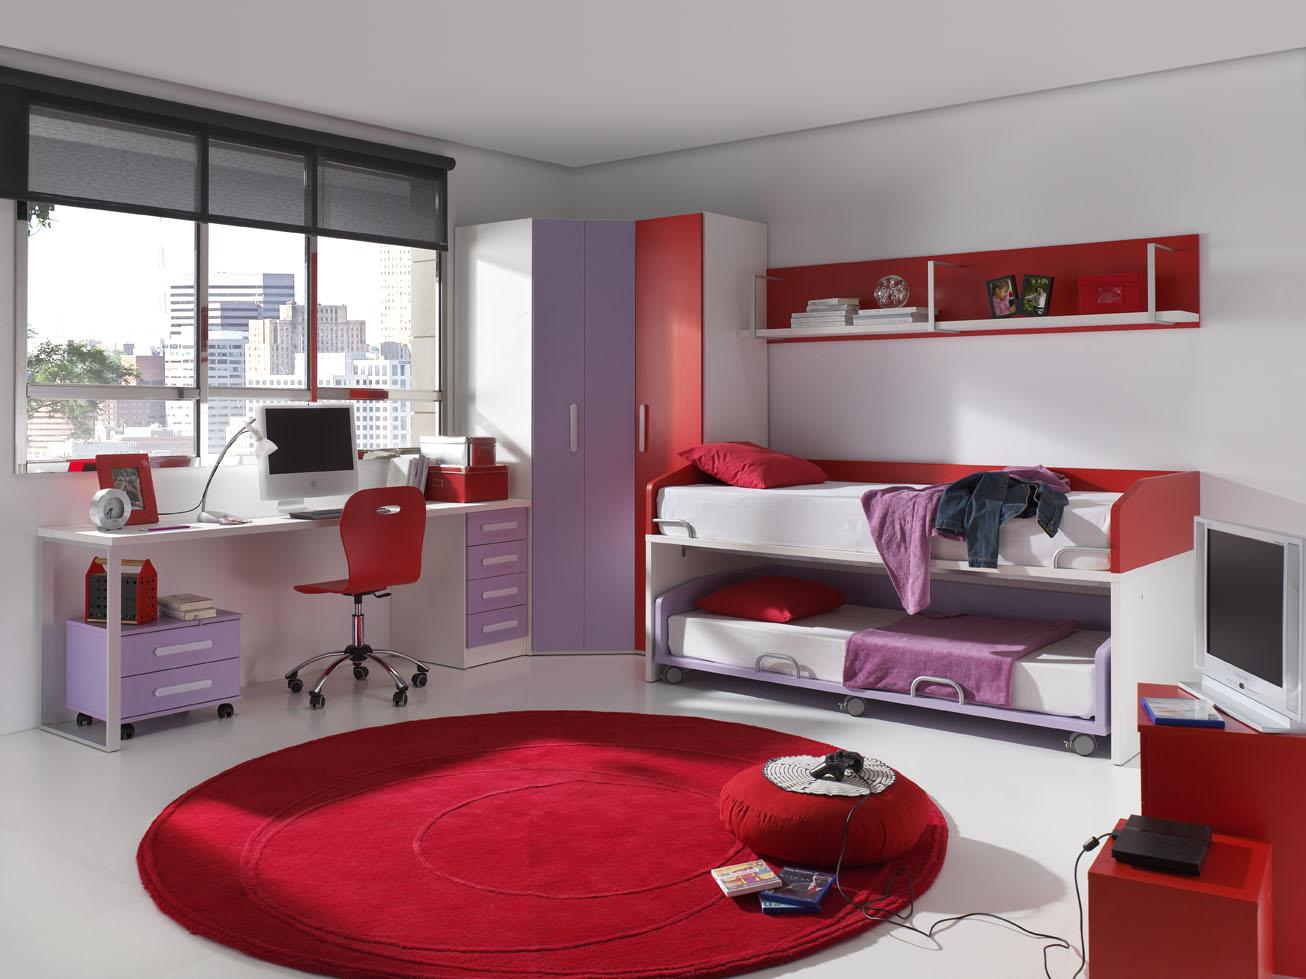 Dormitorios hermosos for Decoracion habitacion matrimonio moderna